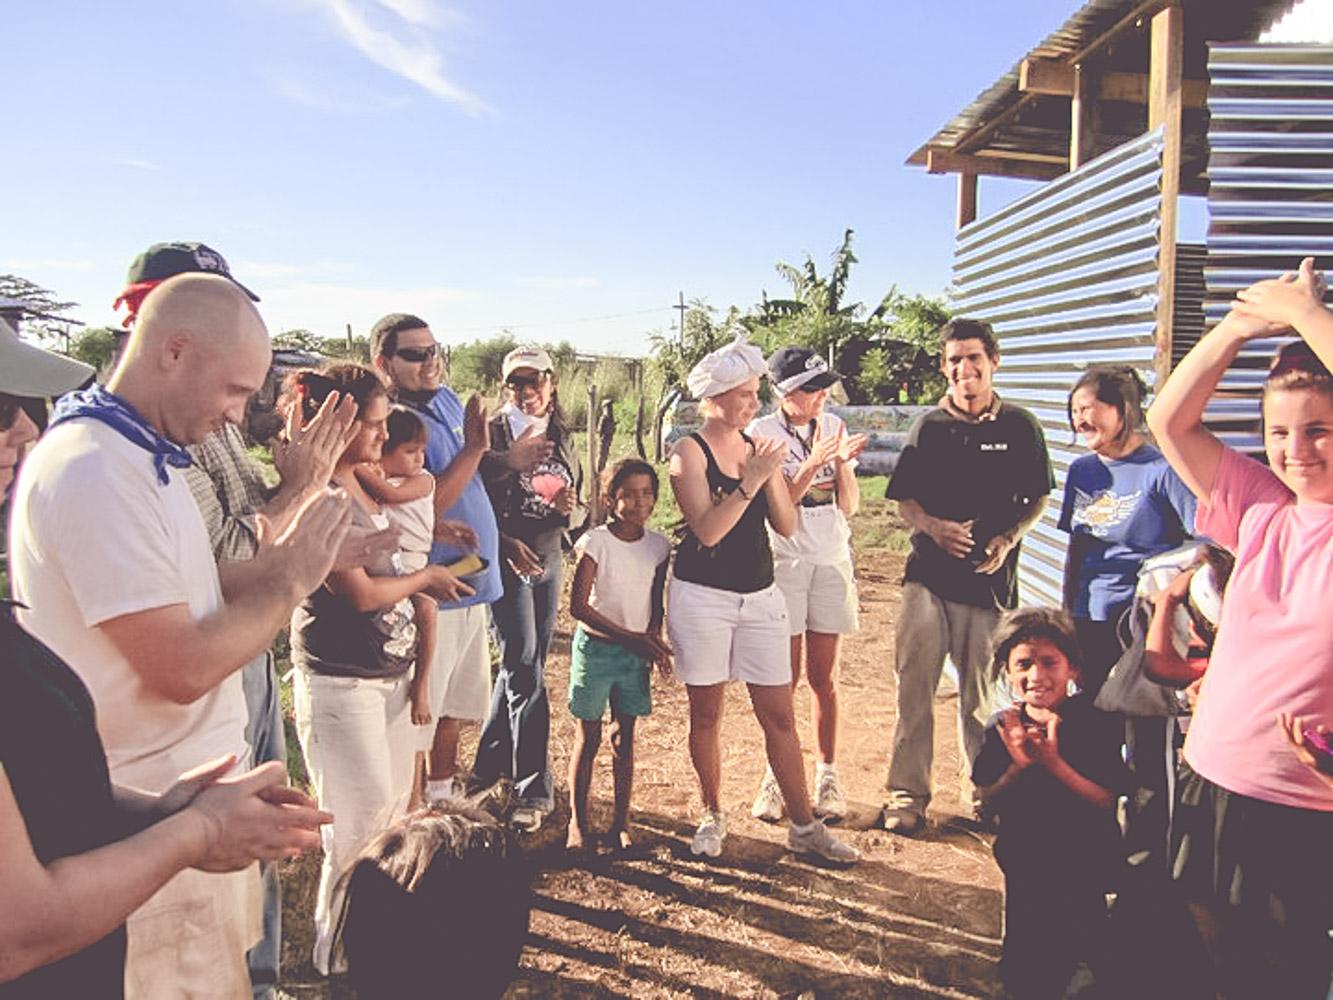 lifeway-church-home-dedication-cristo-rey-new-life-nicaragua